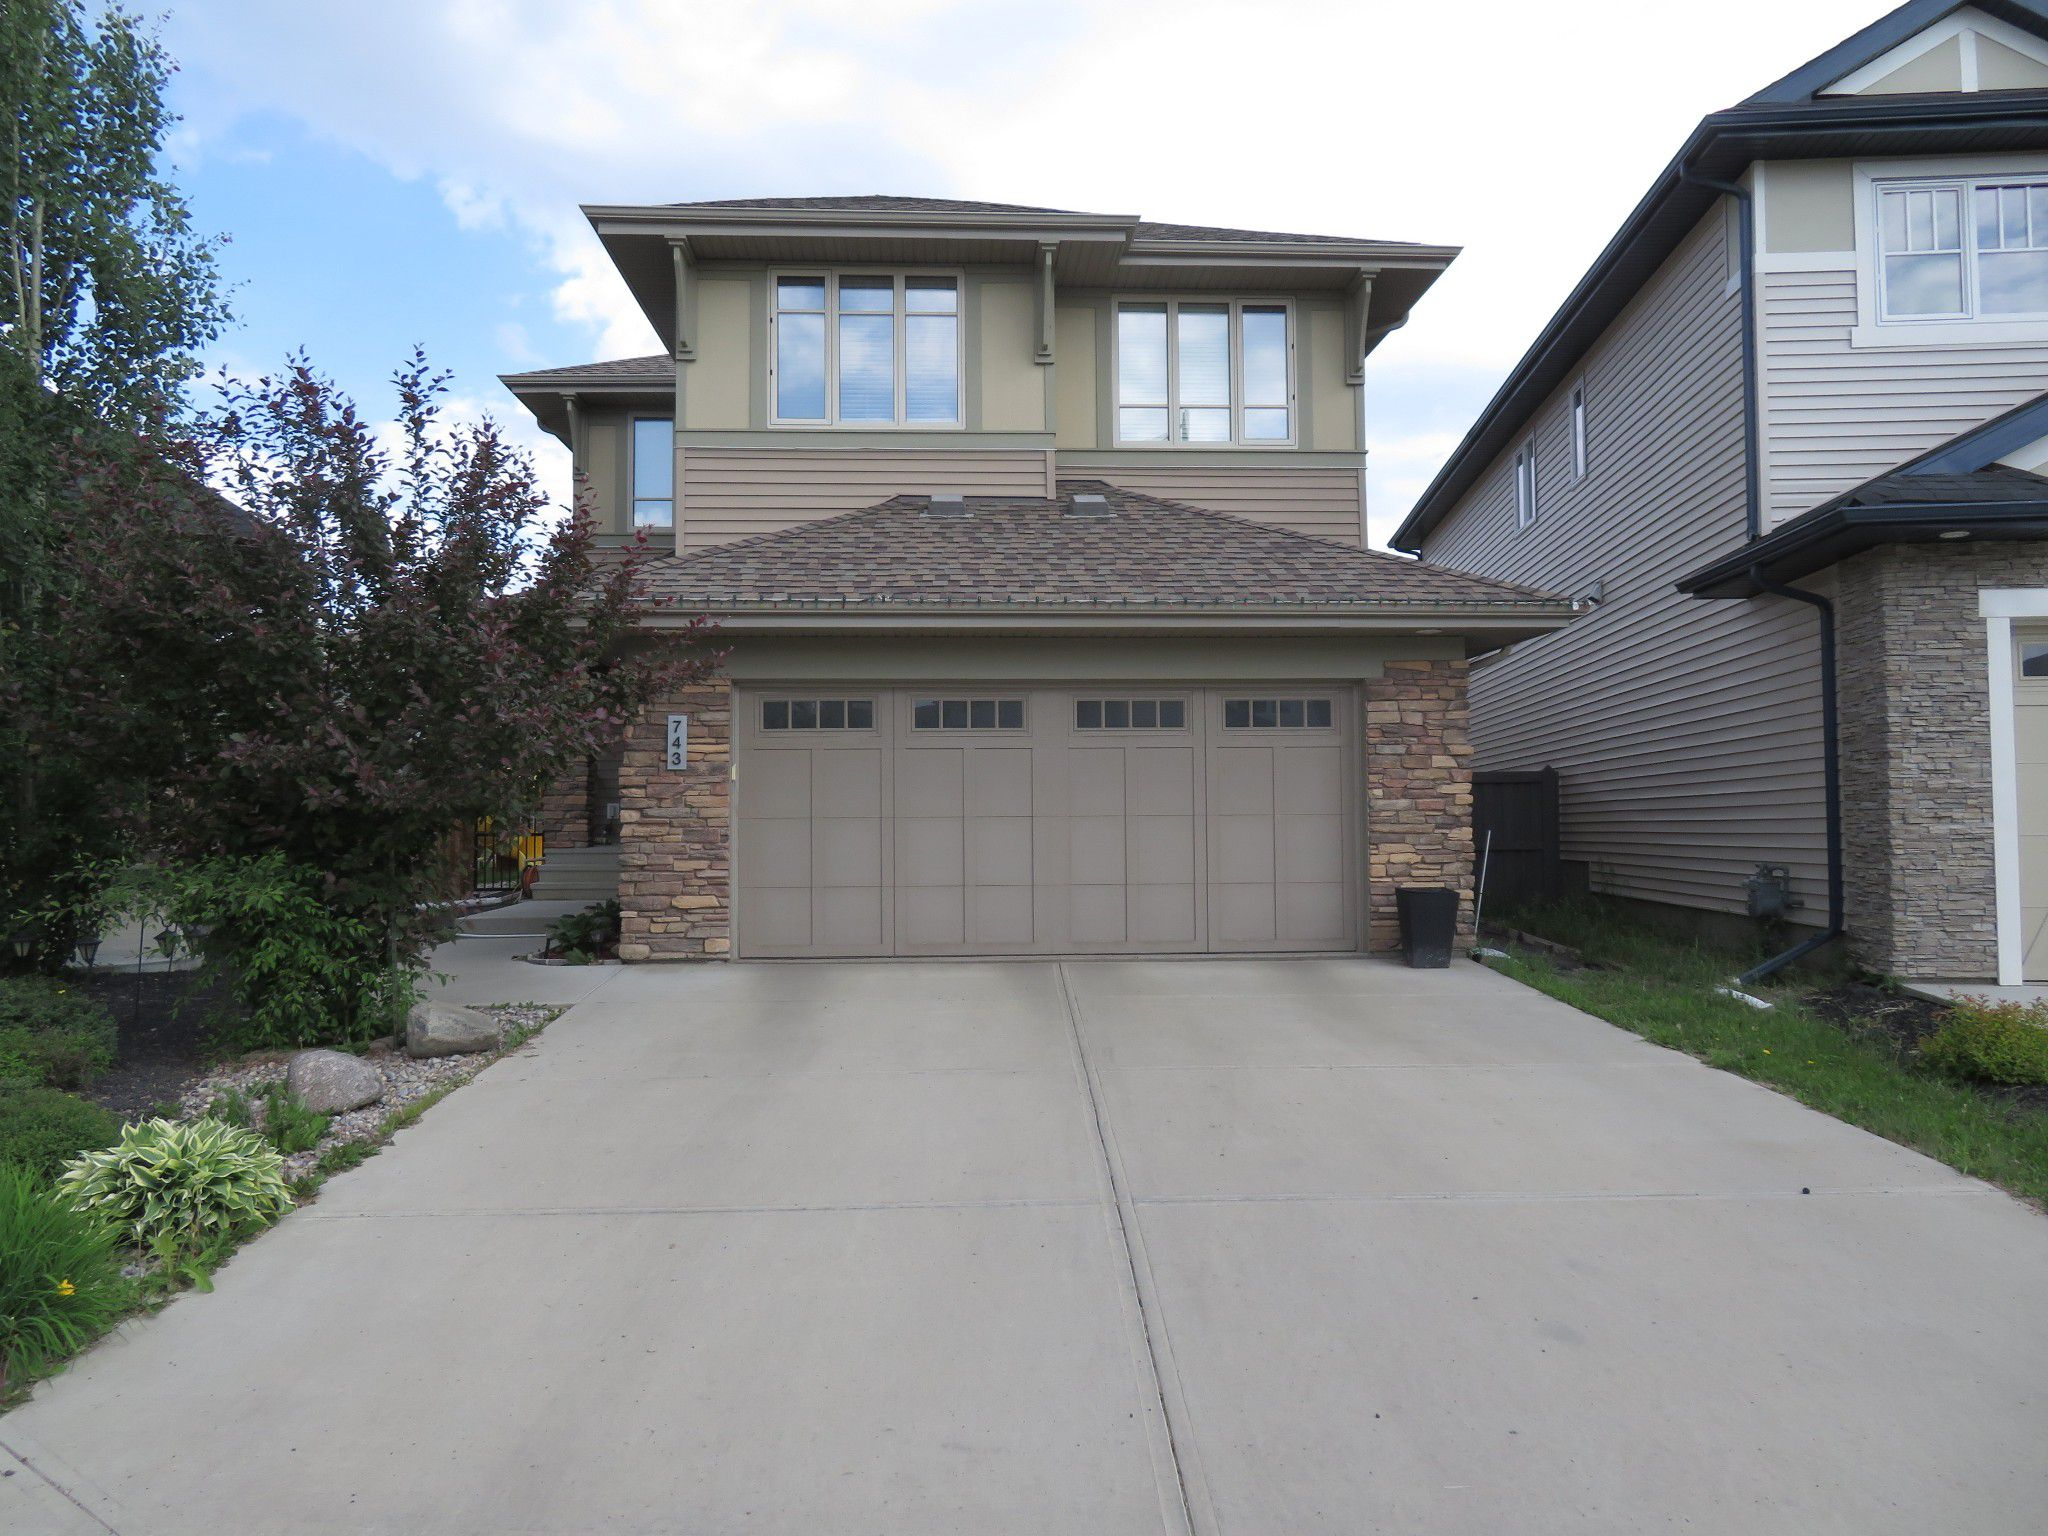 Main Photo: 742 Adams Way: House for sale